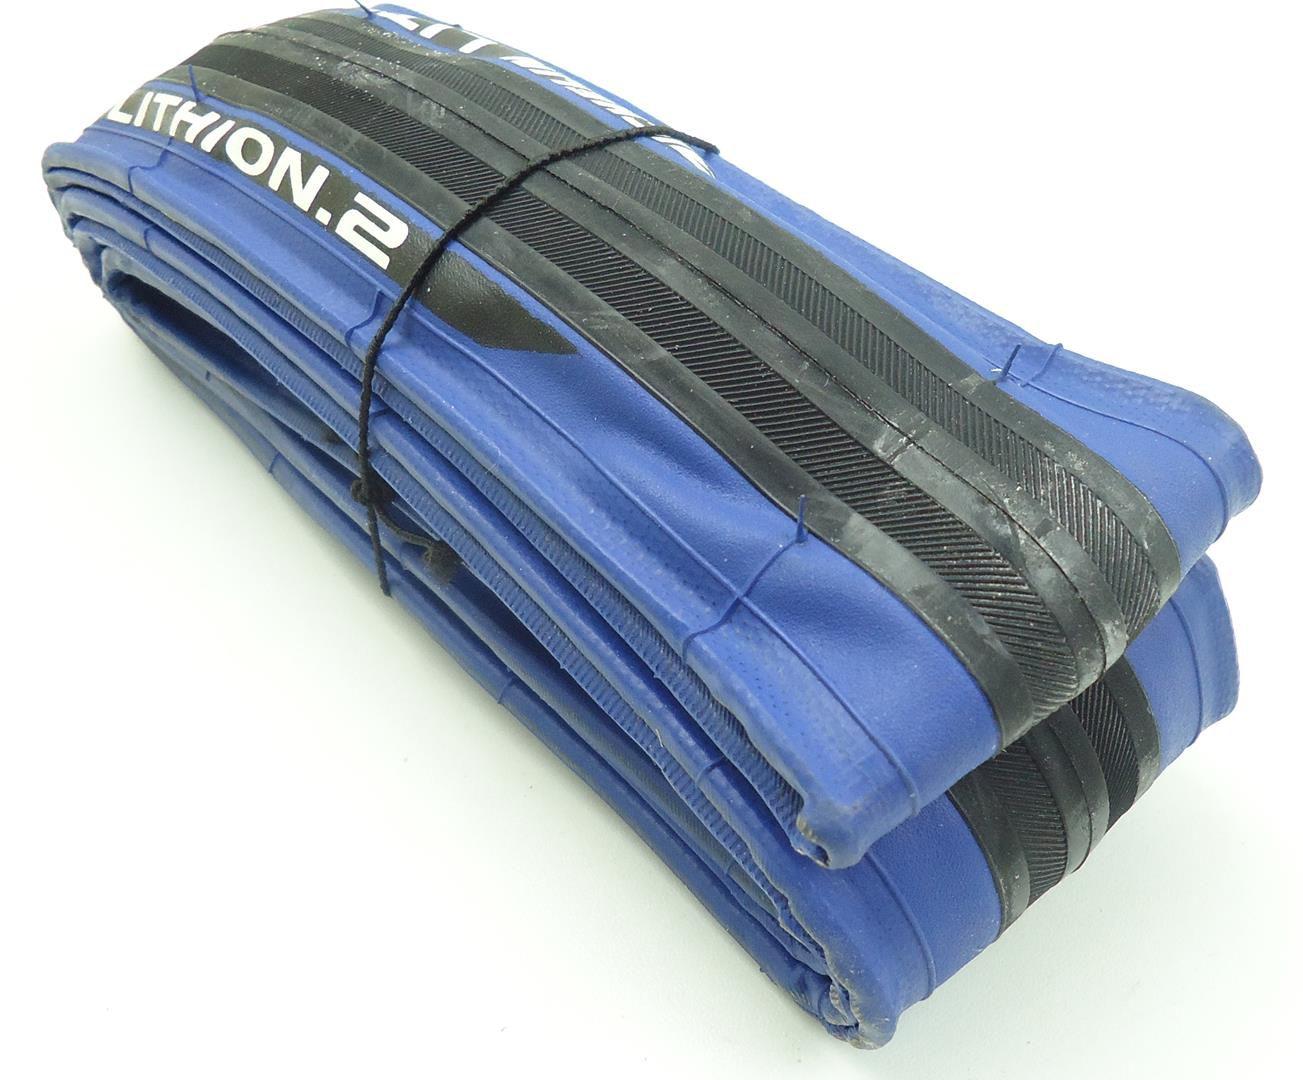 Pneu Bicicleta Speed Michelin Lithion 2 700x23 Borda Azul Dobravél em Kevlar